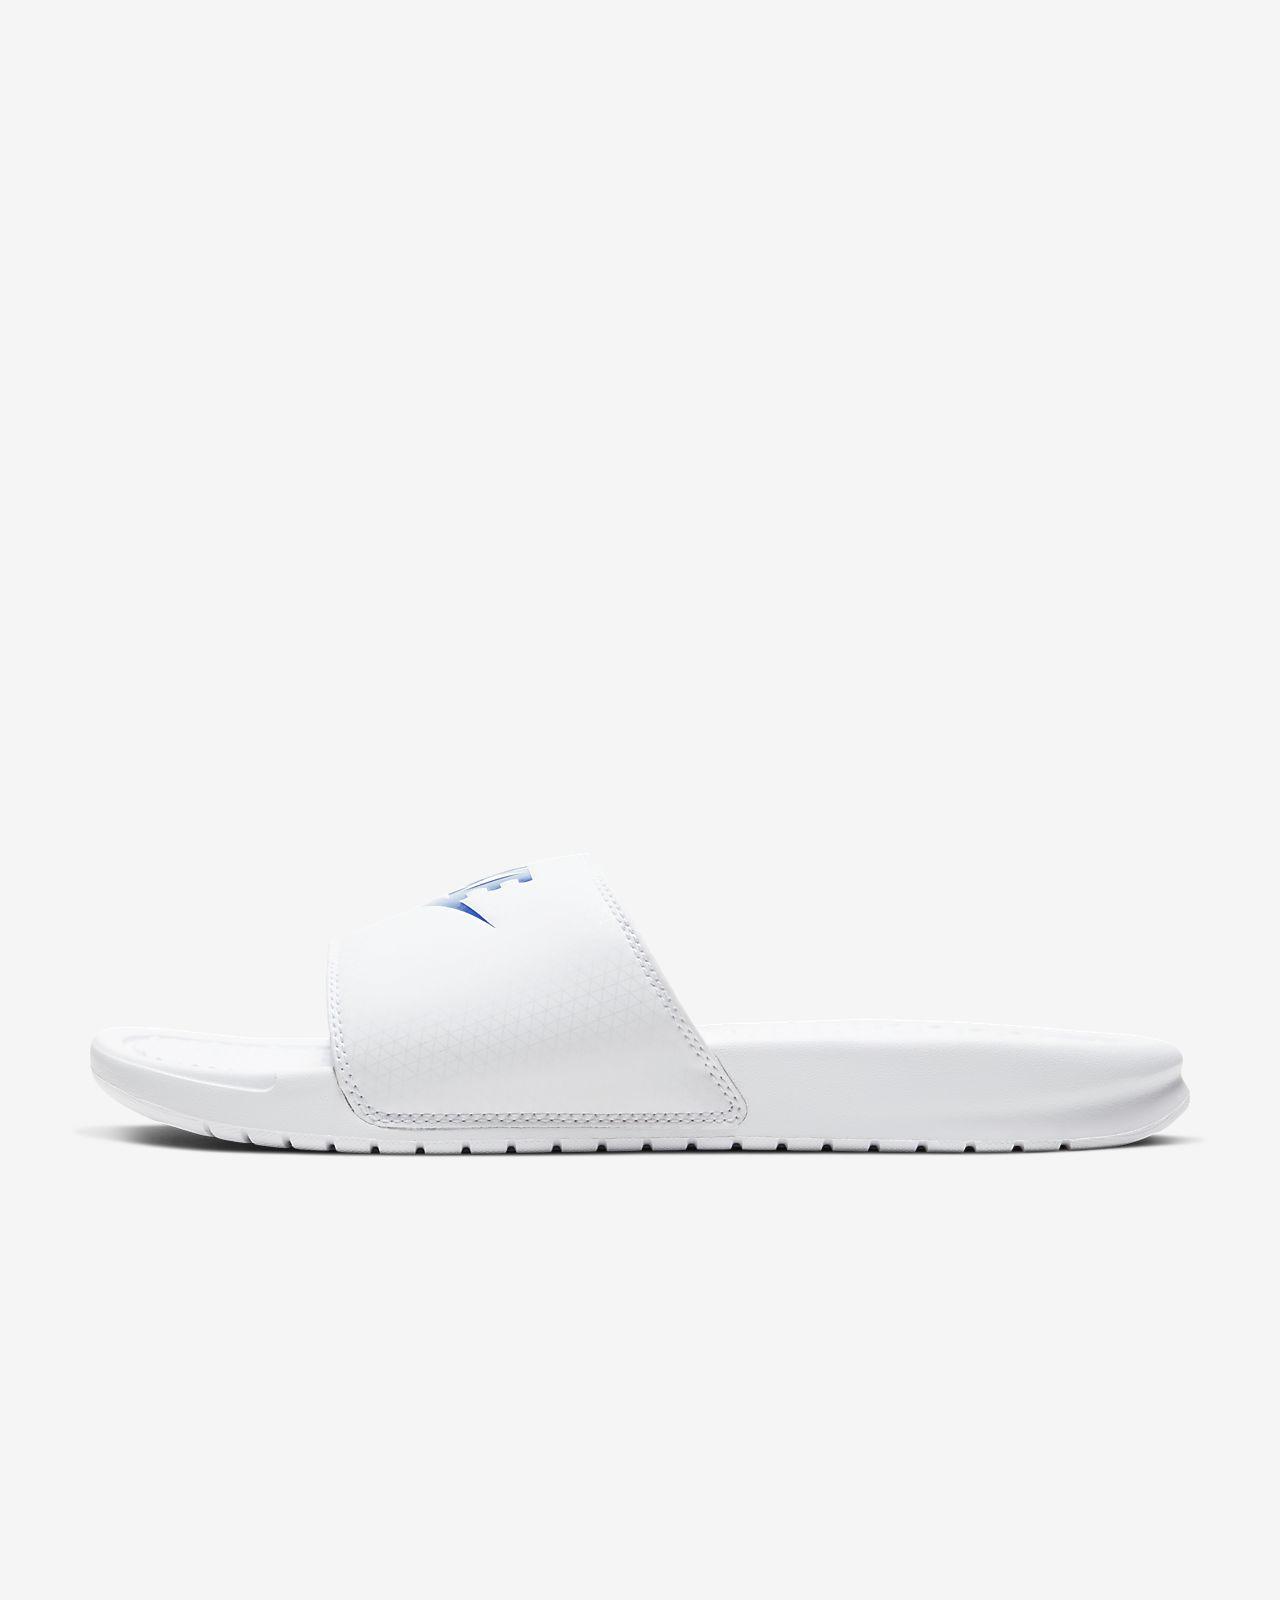 wholesale dealer 5f056 f0fba Low Resolution Claquette Nike Benassi Claquette Nike Benassi